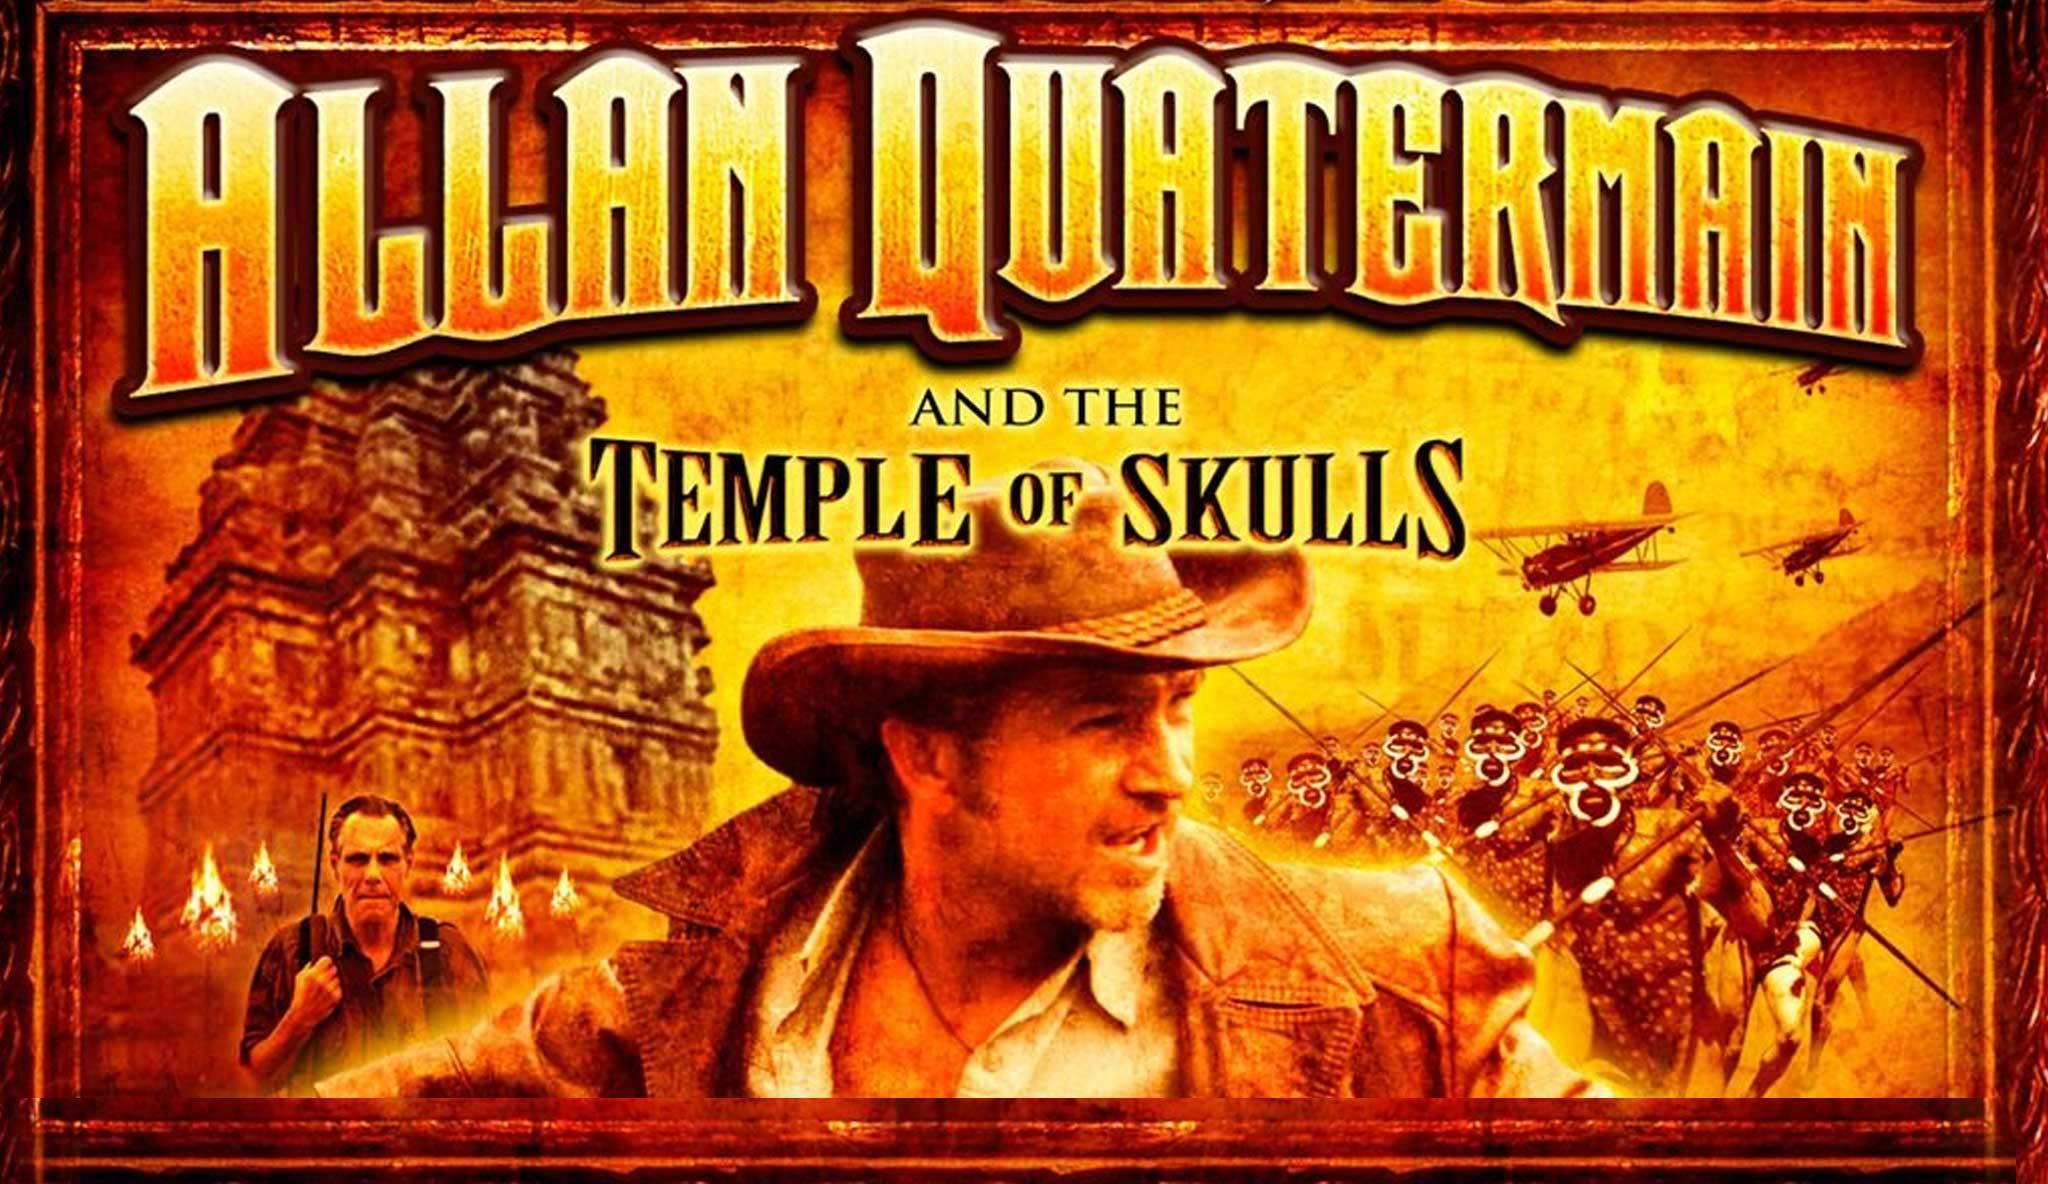 allan-quatermain-and-the-temple-of-skulls\header.jpg